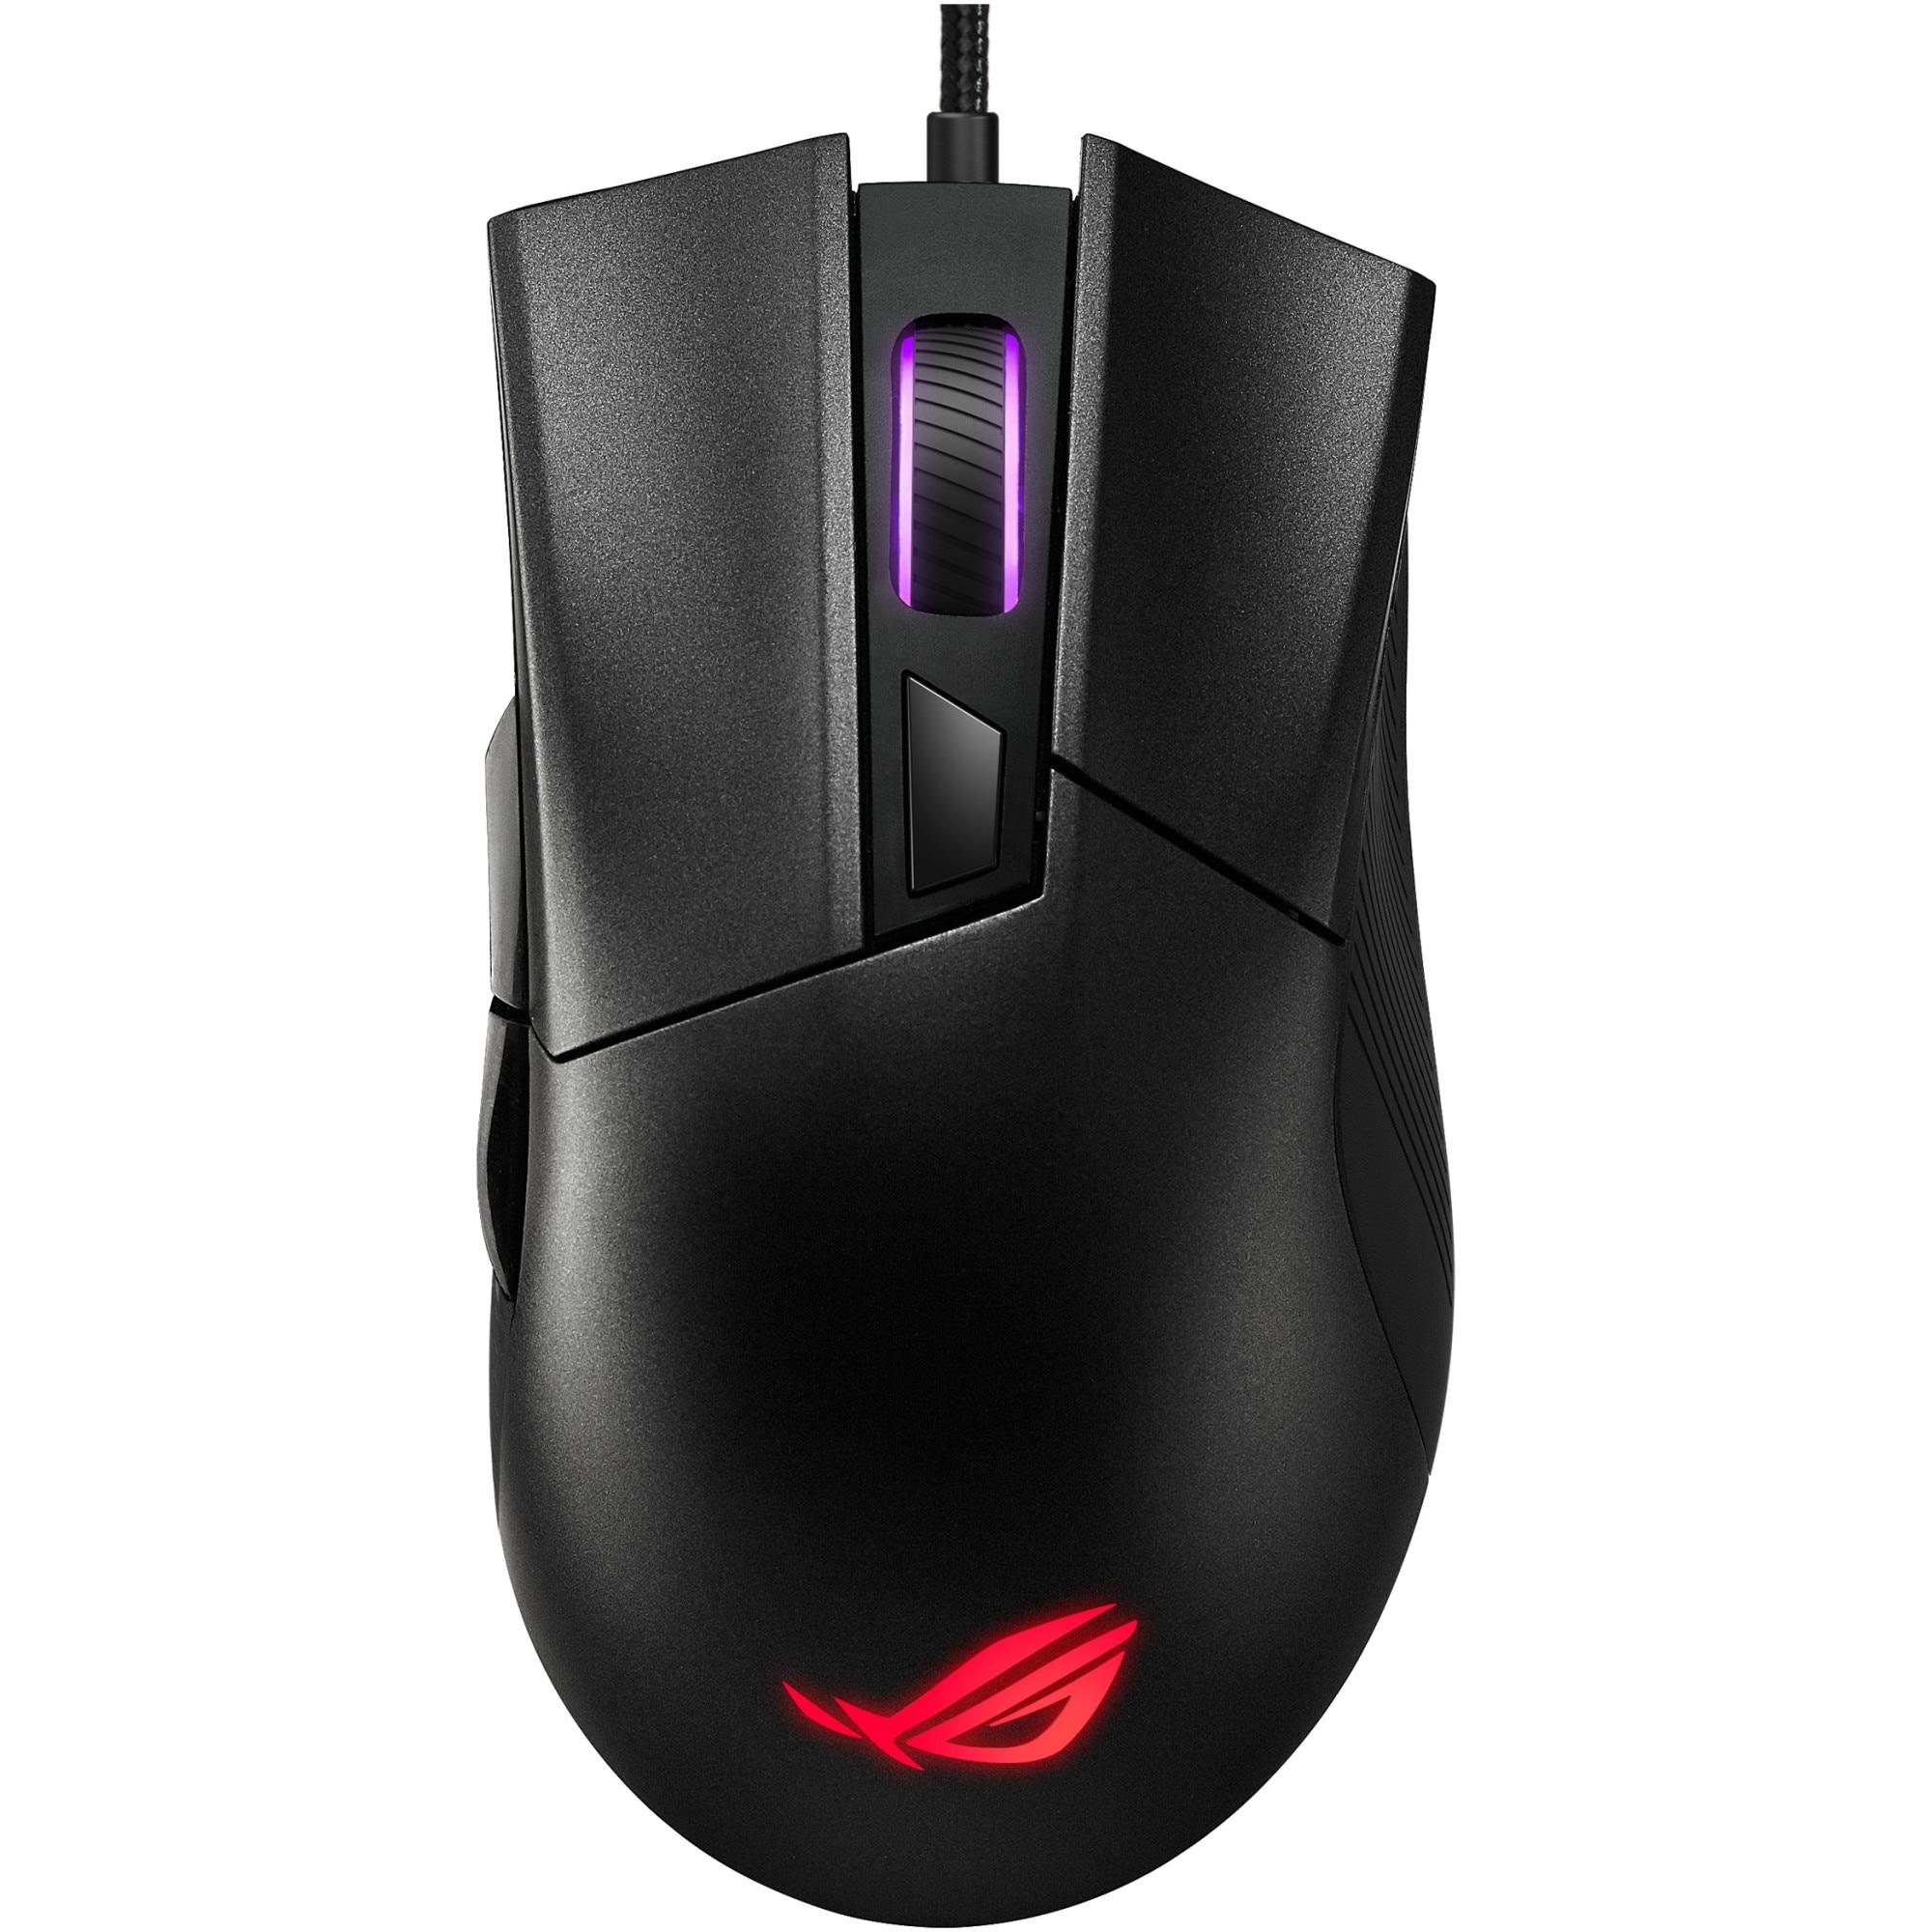 Fotografie Mouse gaming ASUS ROG Gladius II Core, RGB, switch-uri Omron, 6000 dpi, 6 butoane, cablu textil, iluminare Aura Sync, Negru